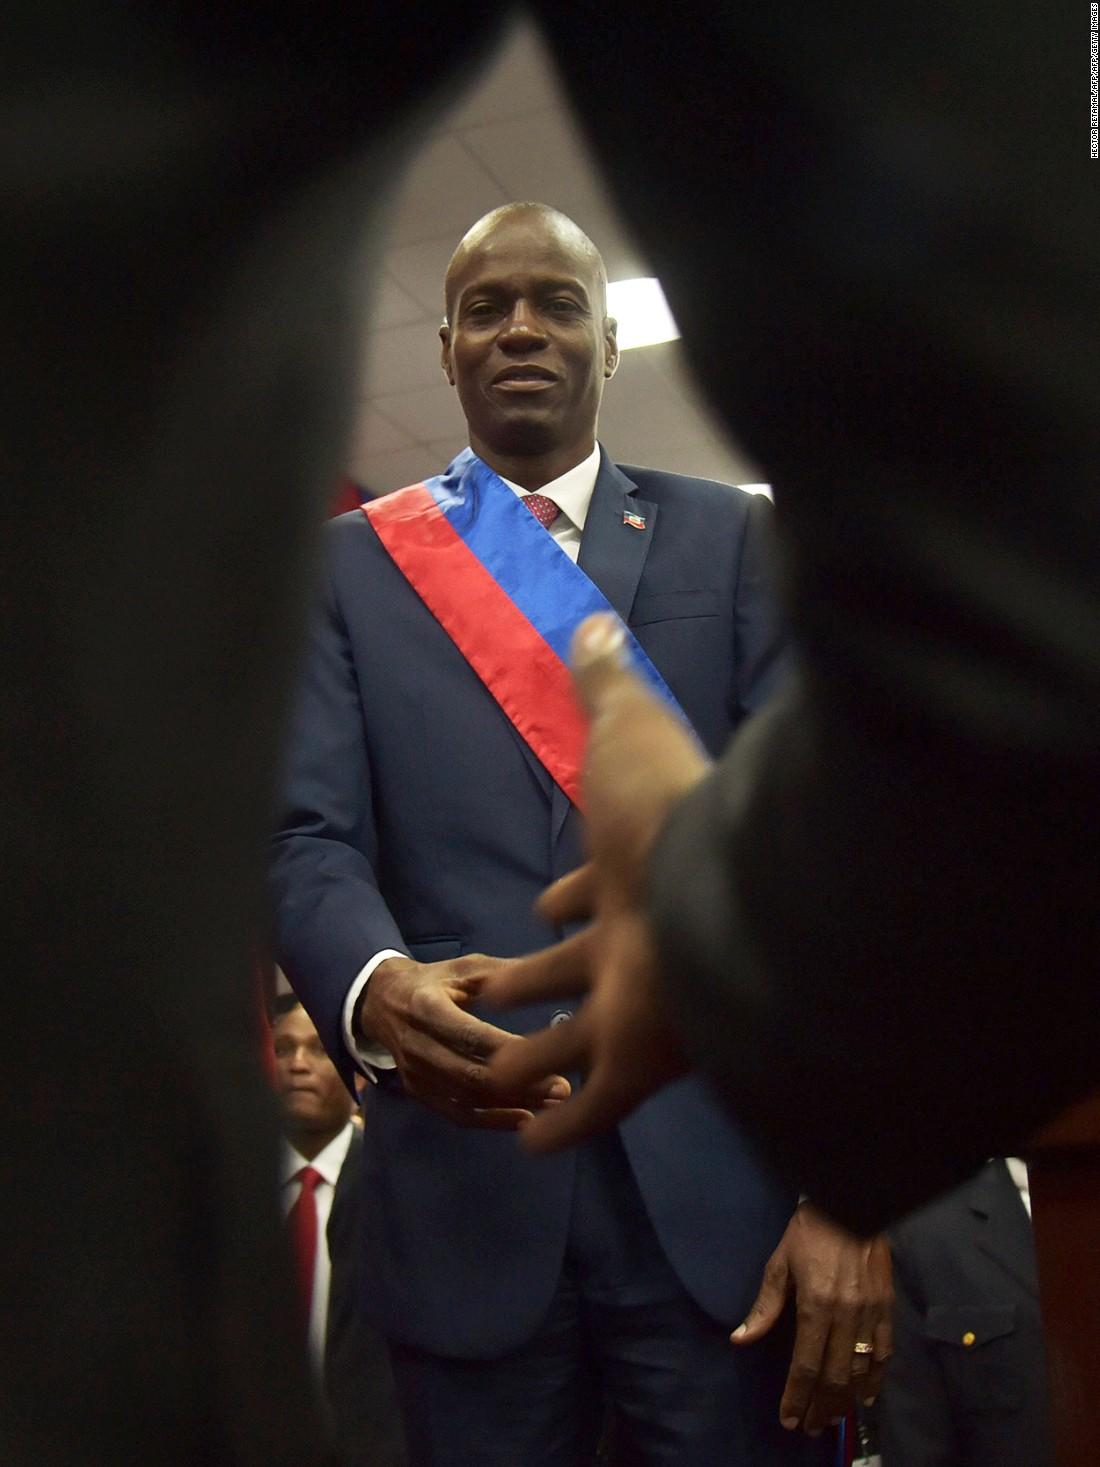 Haiti finally has a president